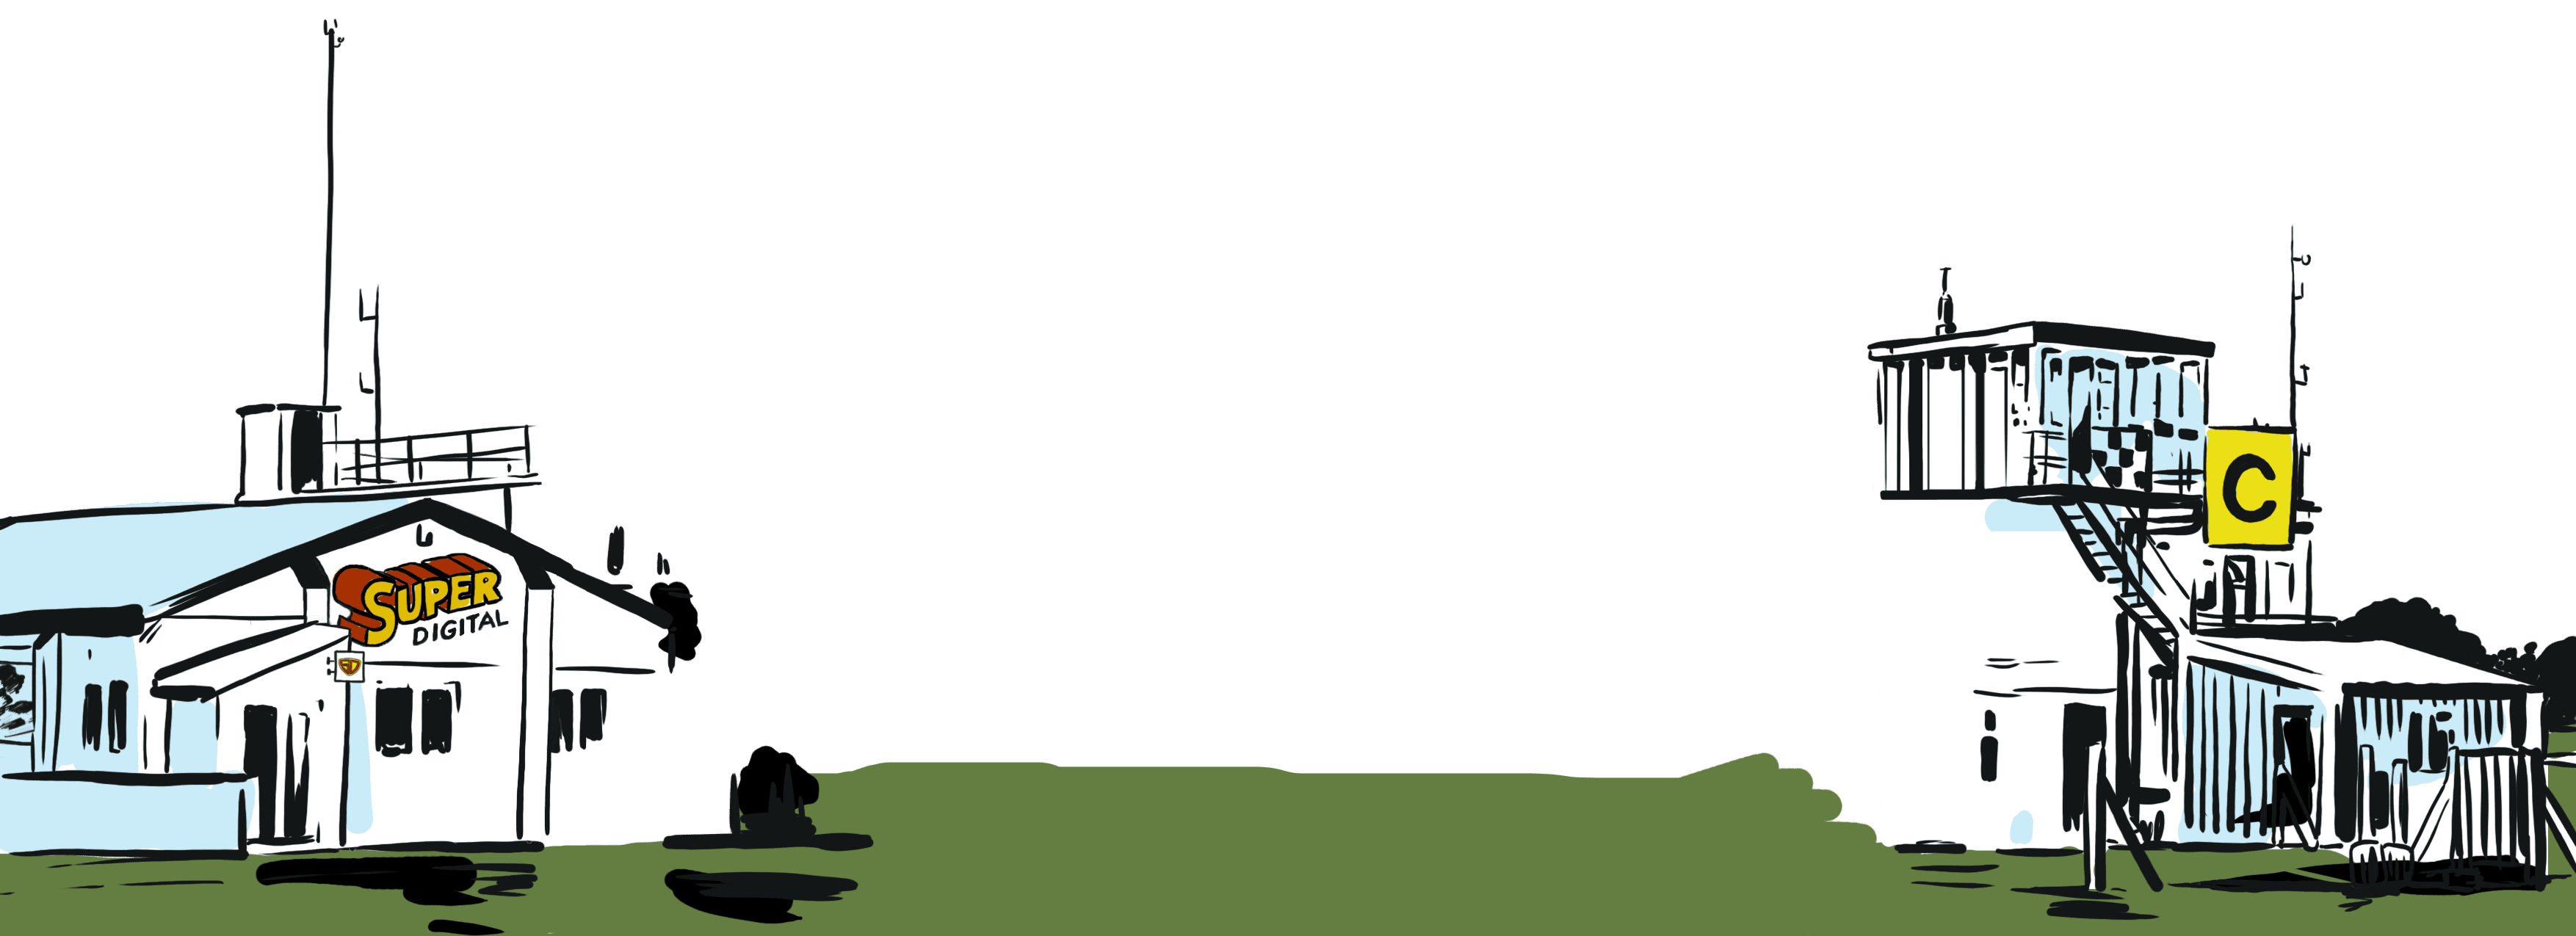 Homepage Animation - Buildings